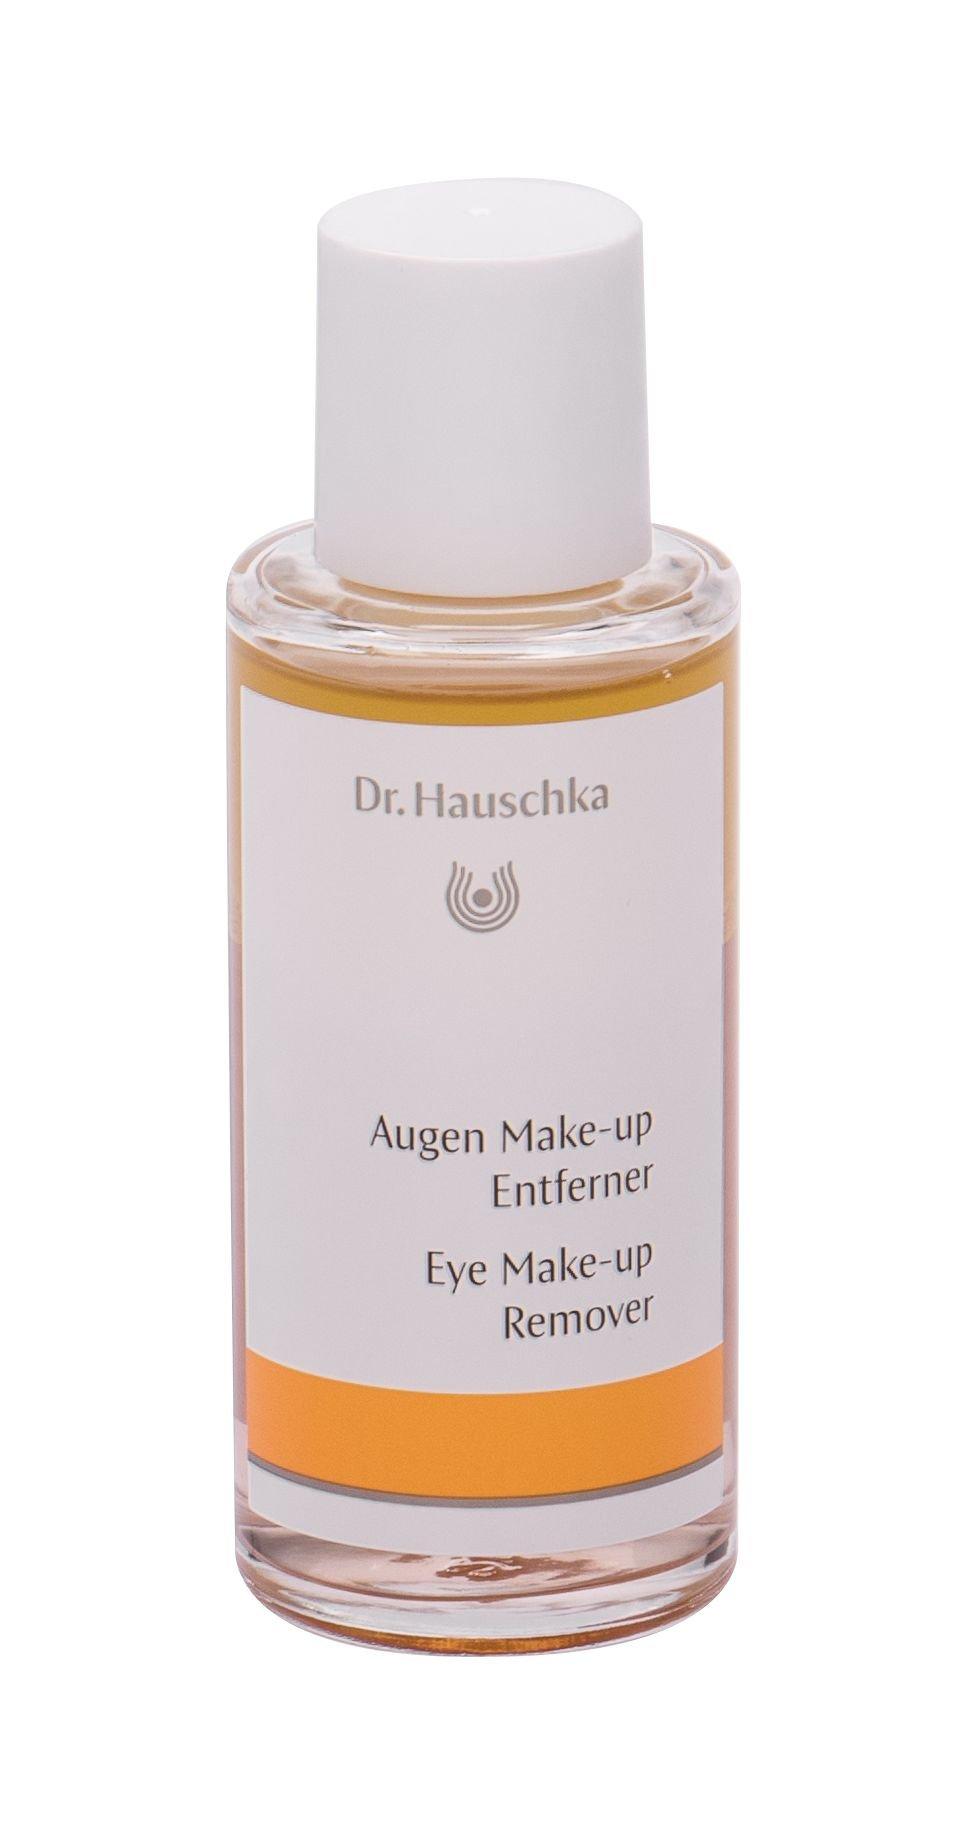 Dr. Hauschka Eye Make-Up Remover Eye Makeup Remover 75ml